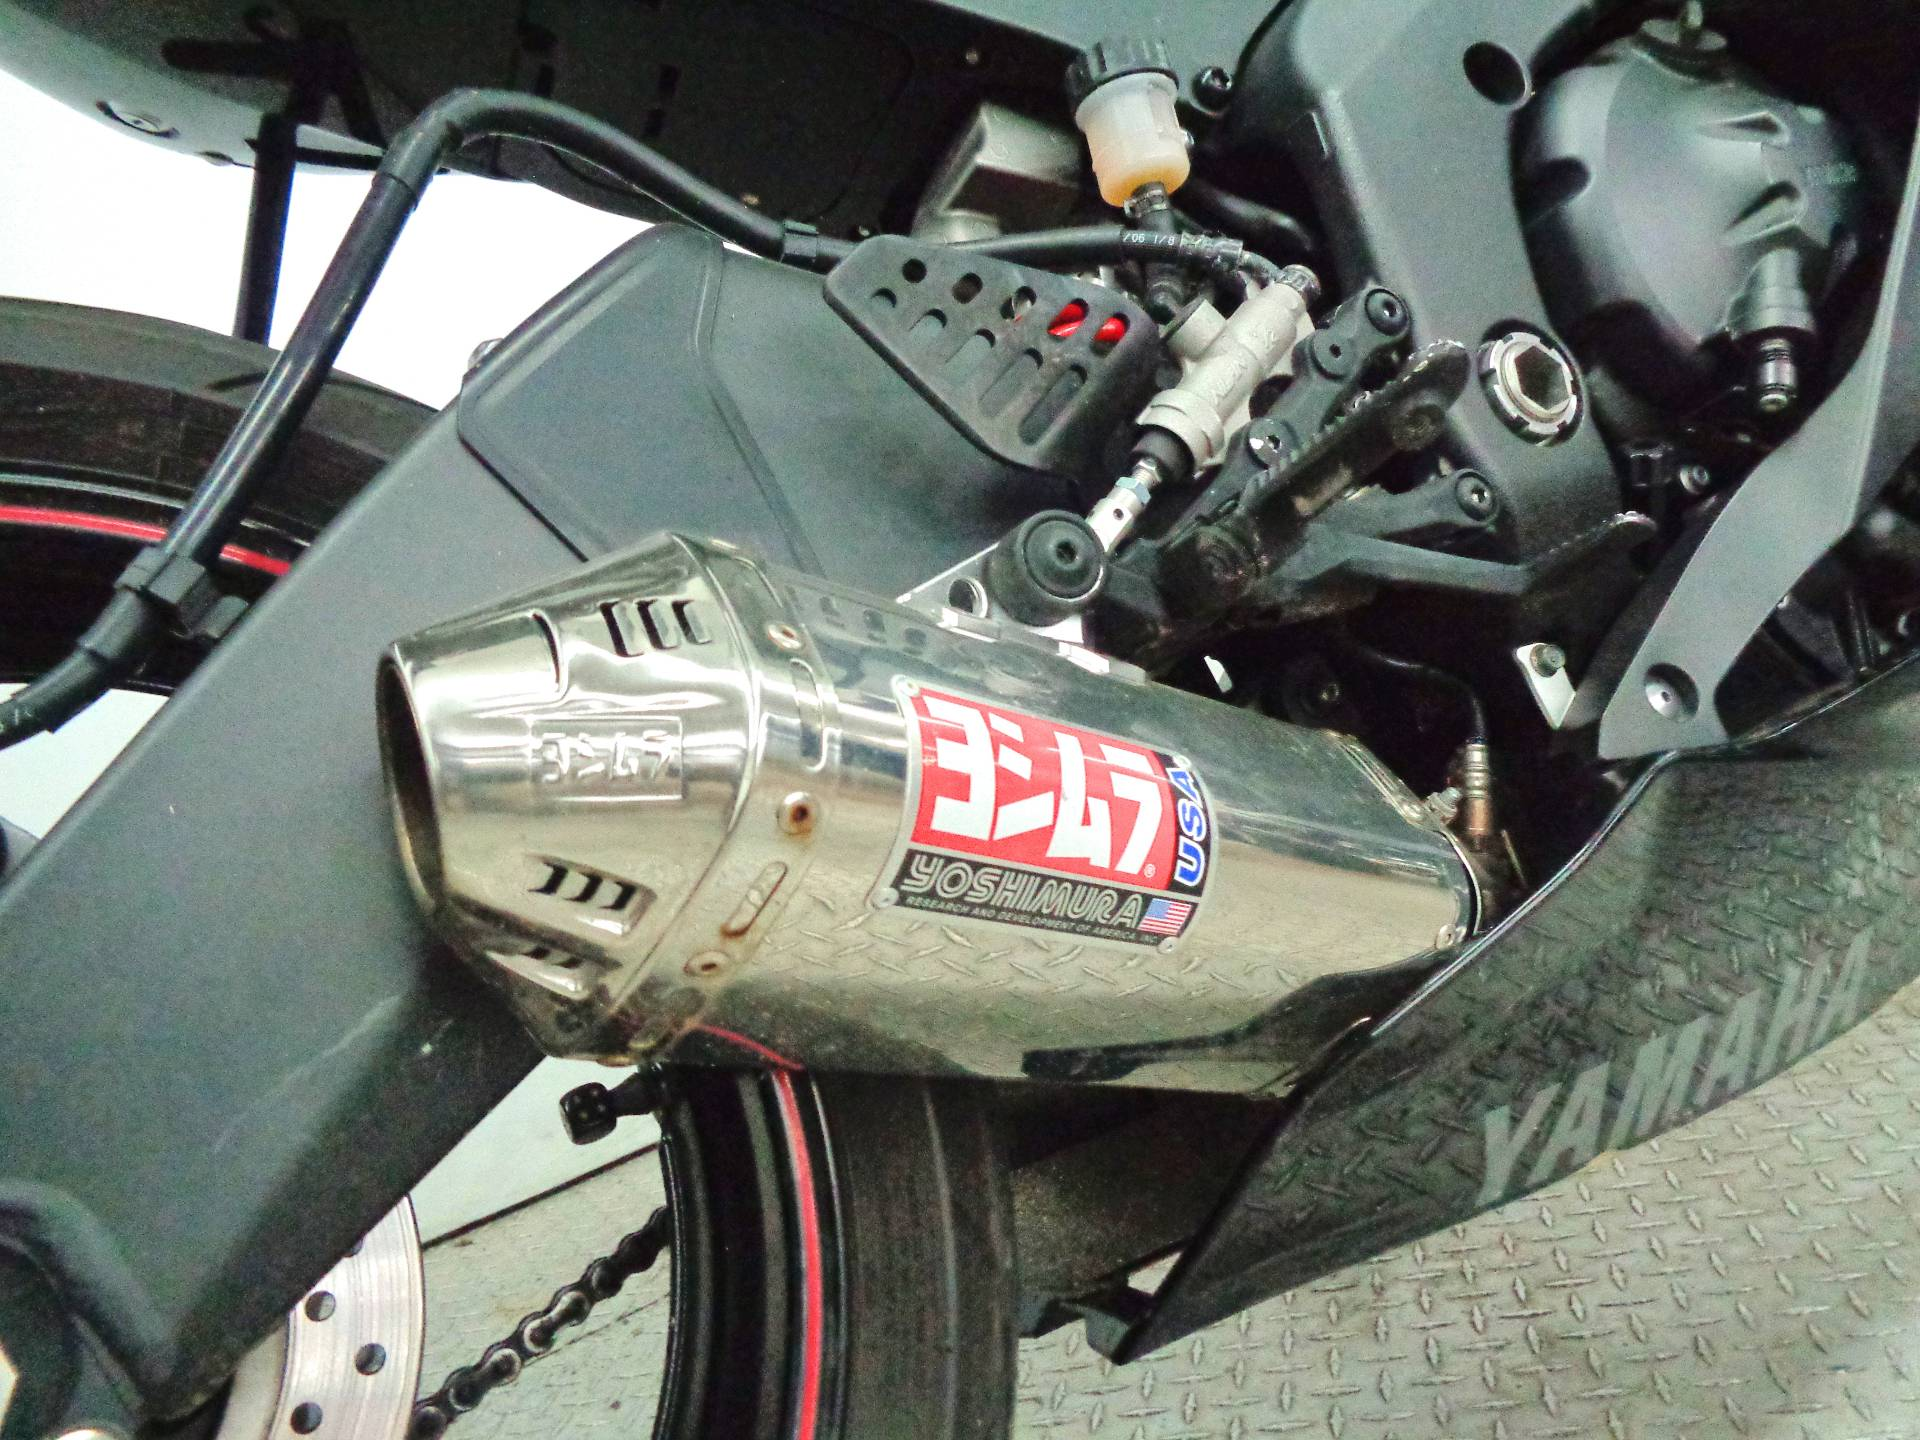 2006 Yamaha YZFR6 4